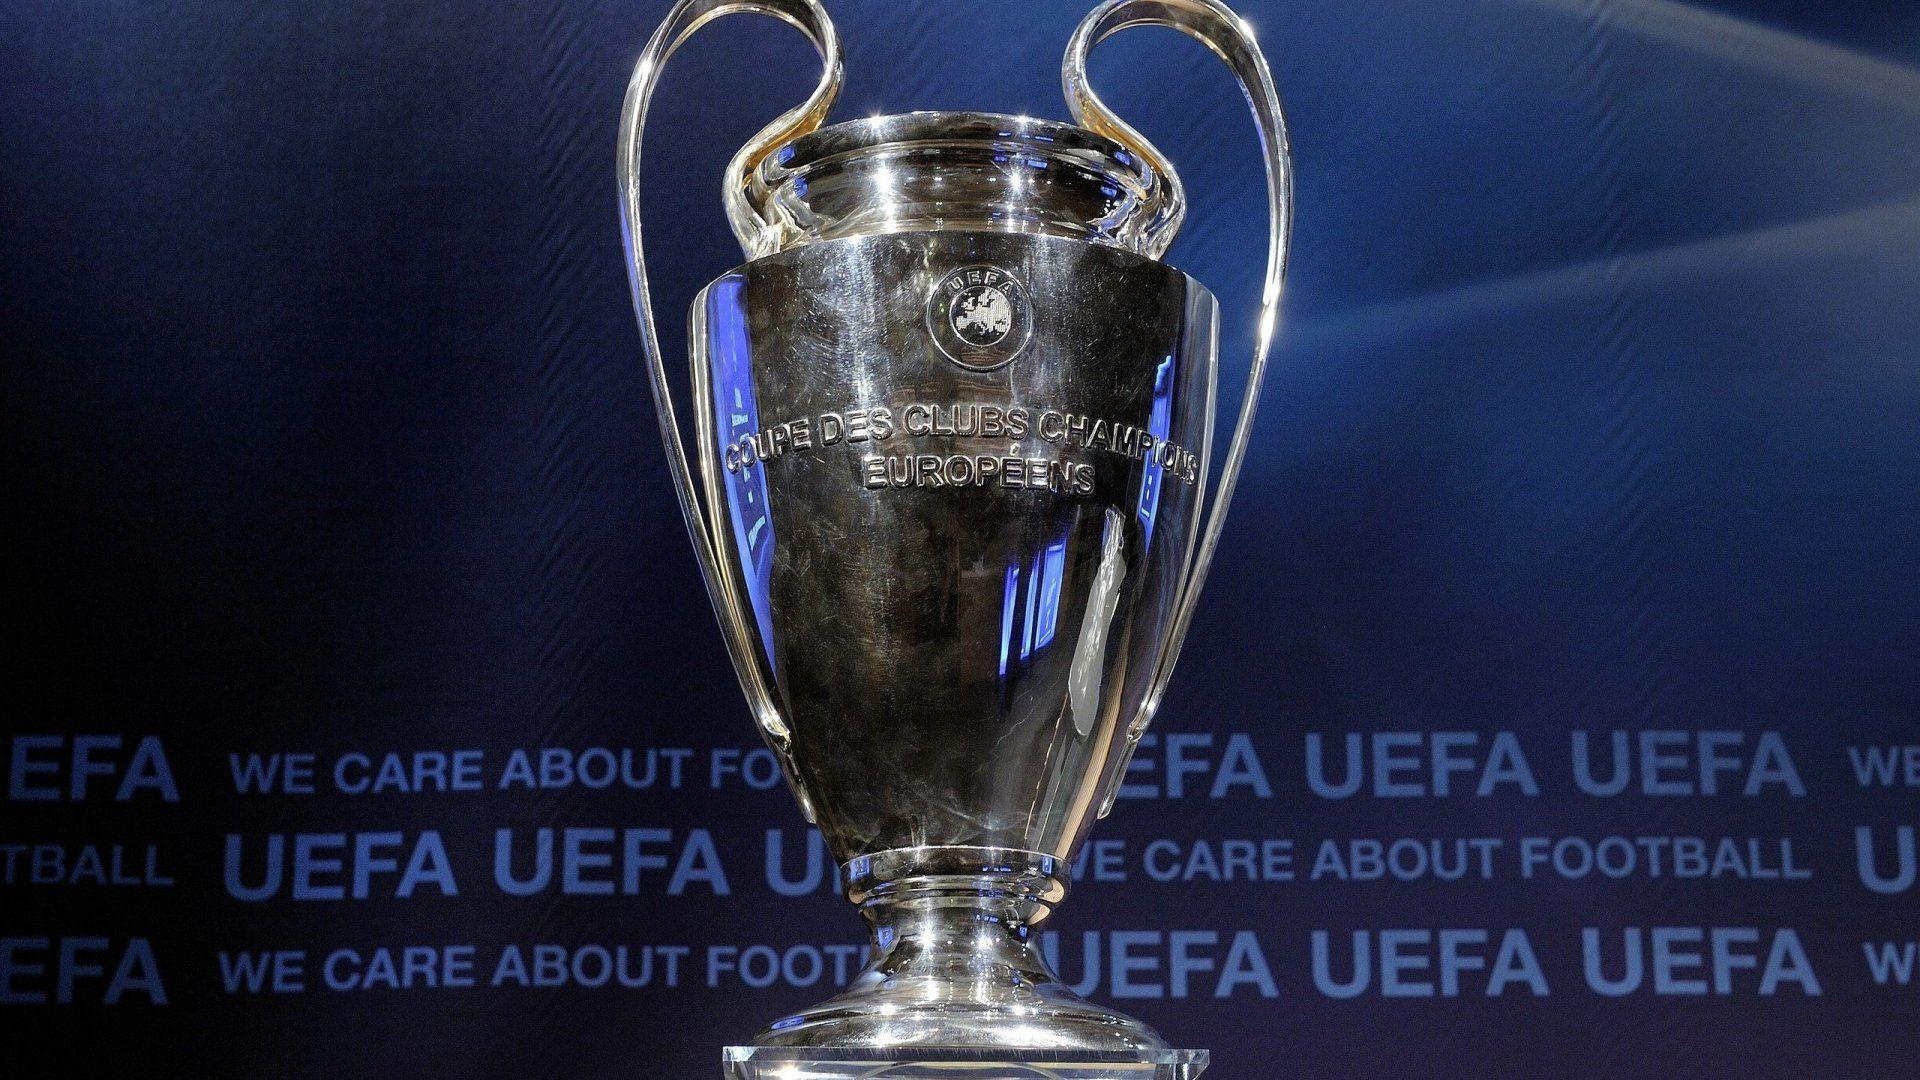 Champions League Trophy Google Search Champions League Champions League Draw Uefa Champions League